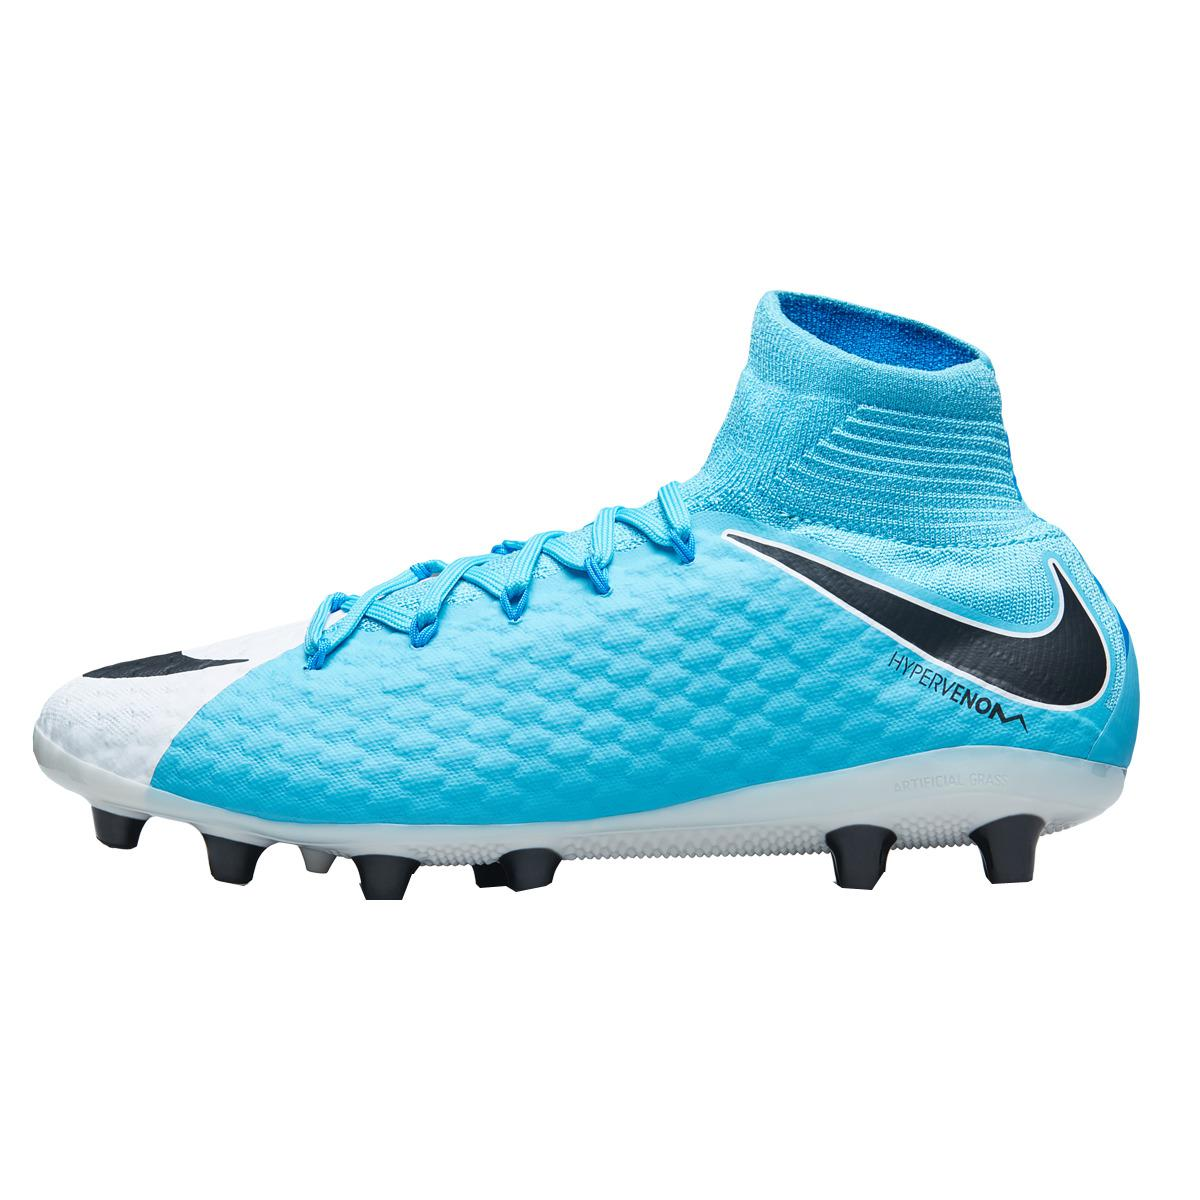 9222b11cb7ea Nike Hypervenom Phatal Iii Dynamic Fit Ag-pro Football Boots in Blue ...